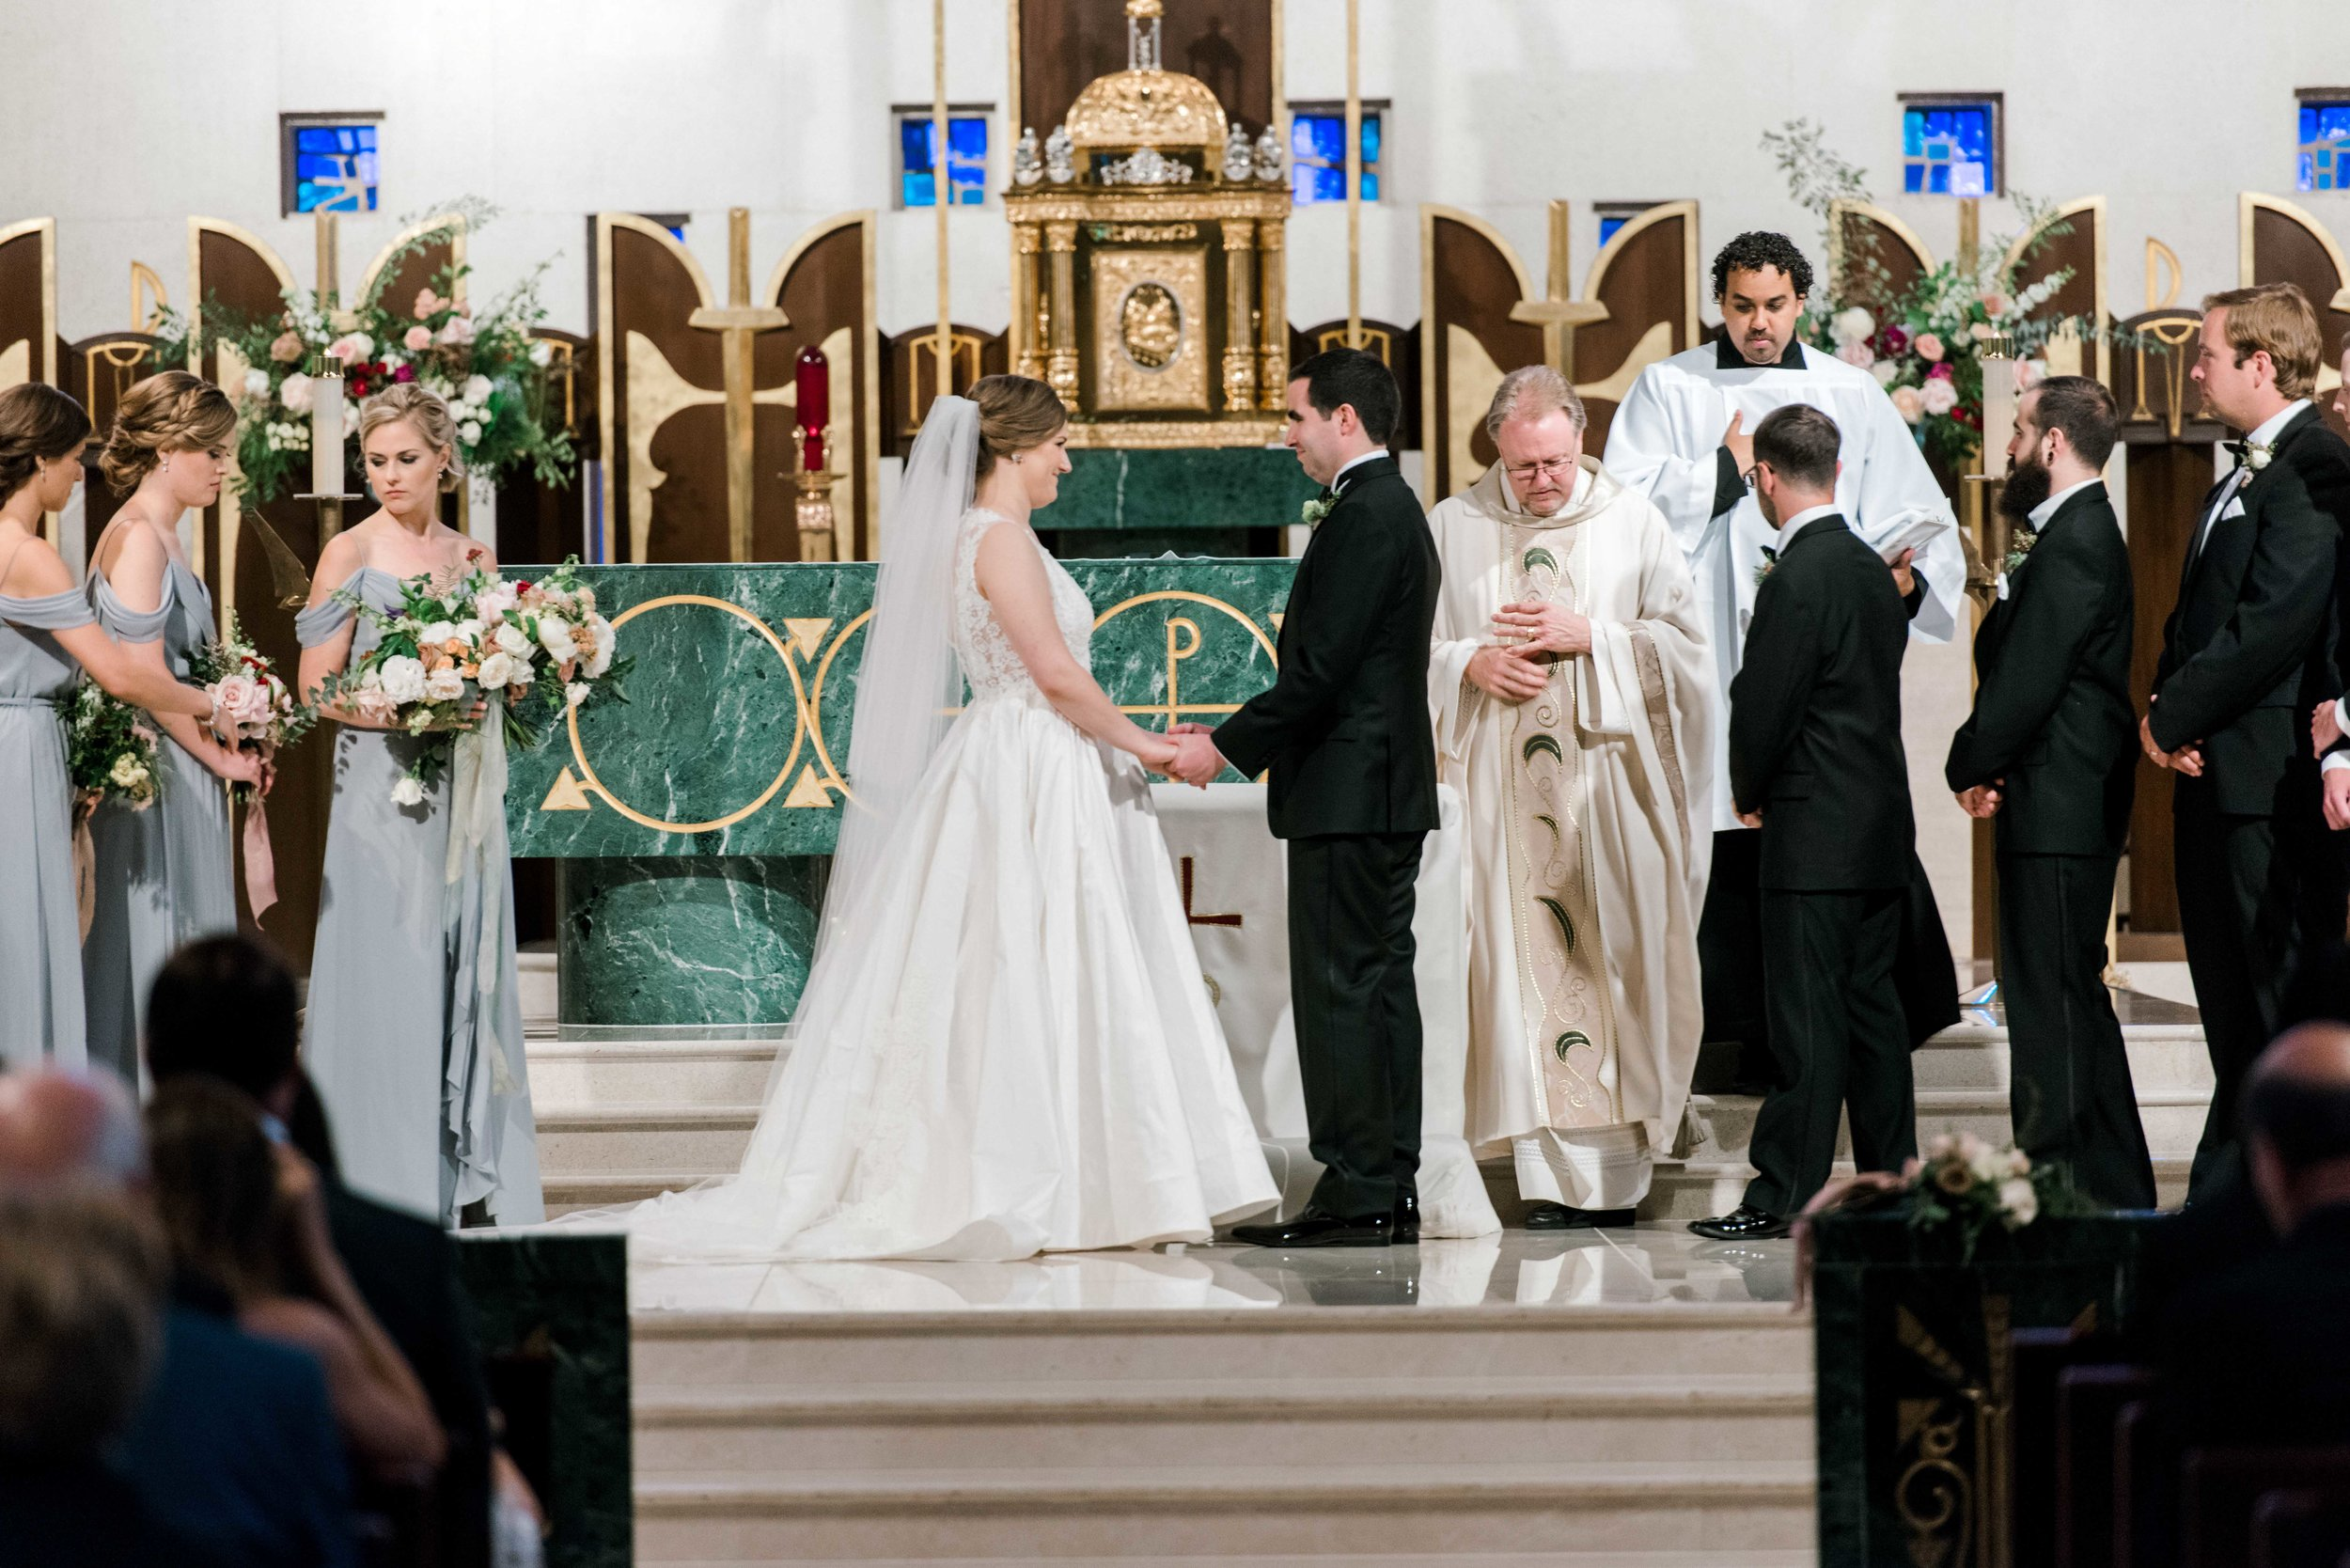 St-Michaels-Catholic-Church-Houston-Wedding-Ceremony-Josh-Dana-Fernandez-Photographer-Destination-Austin-Dallas-Fine-Art-Film-3.jpg